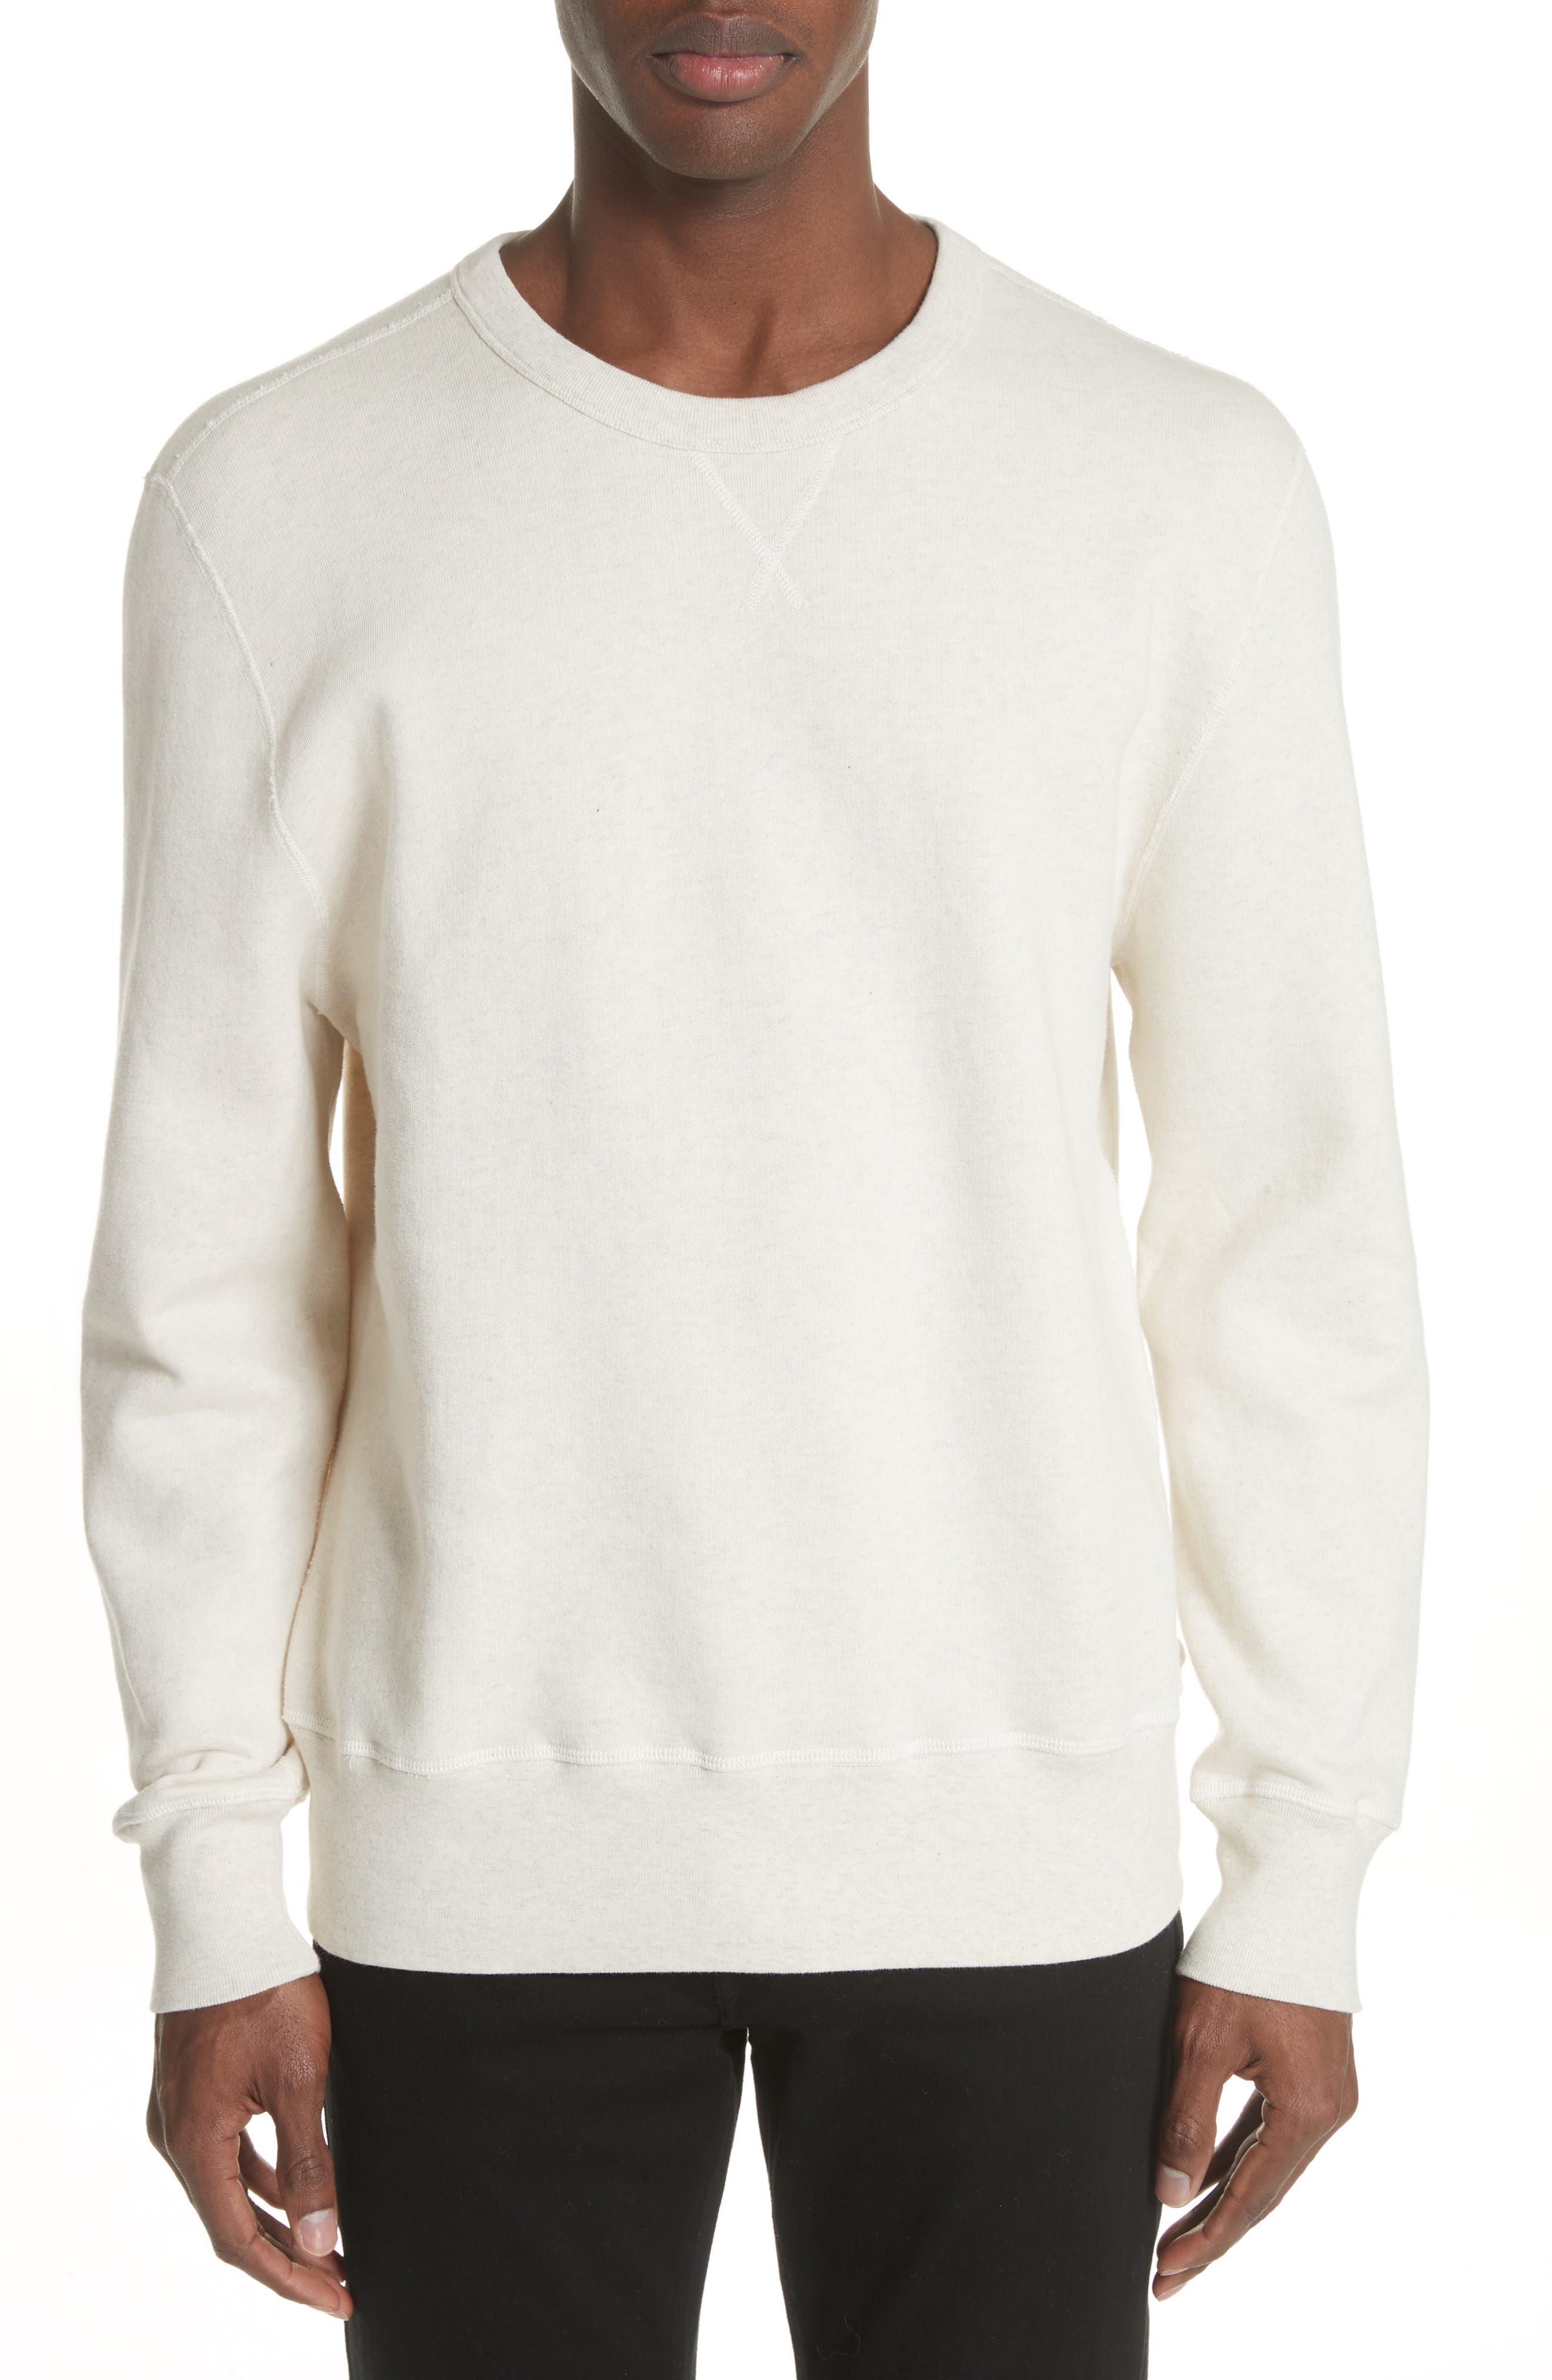 Main Image - OUR LEGACY Crewneck Sweatshirt